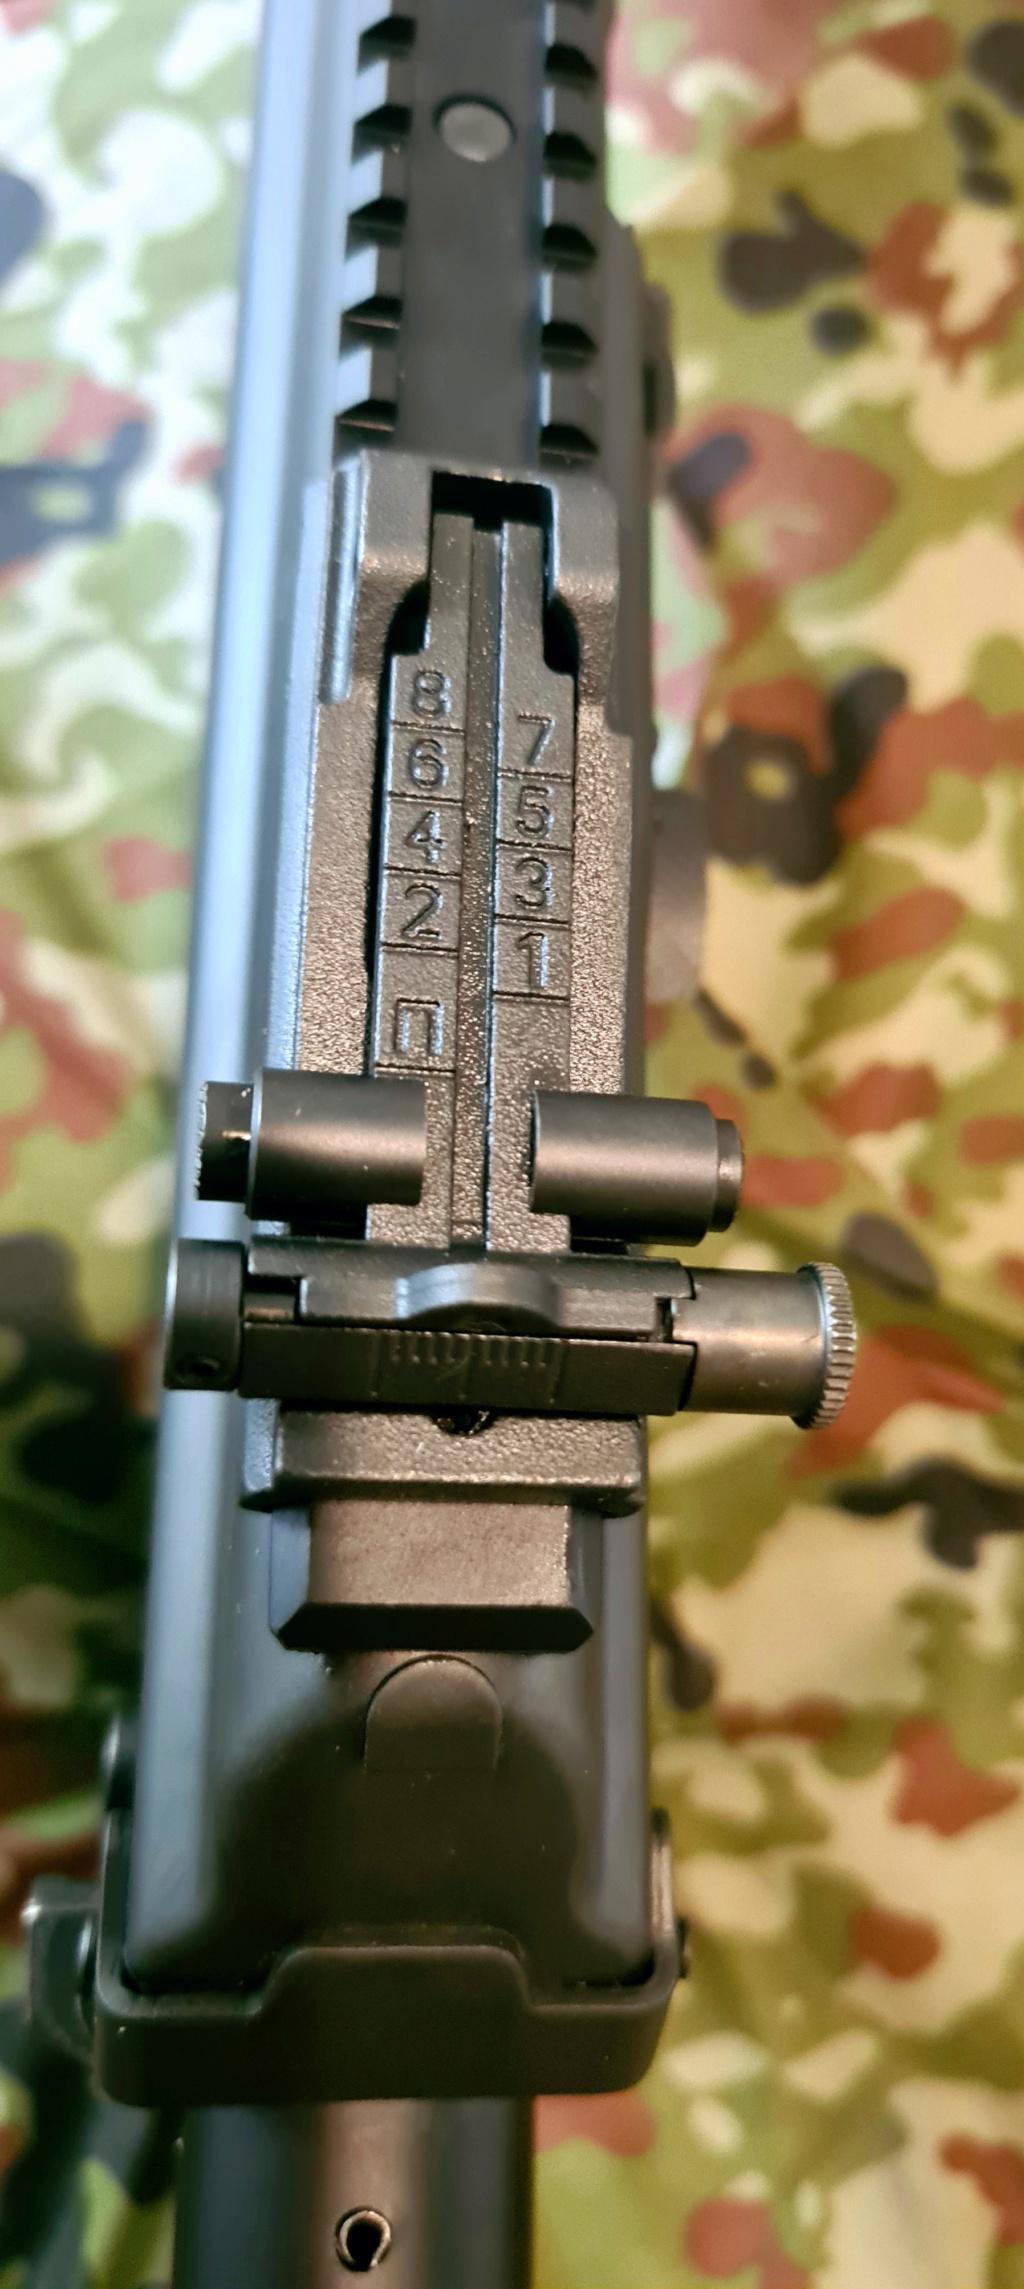 ARCTURUS - AT-AK 12 - AEG - Review Terminée! 20210821